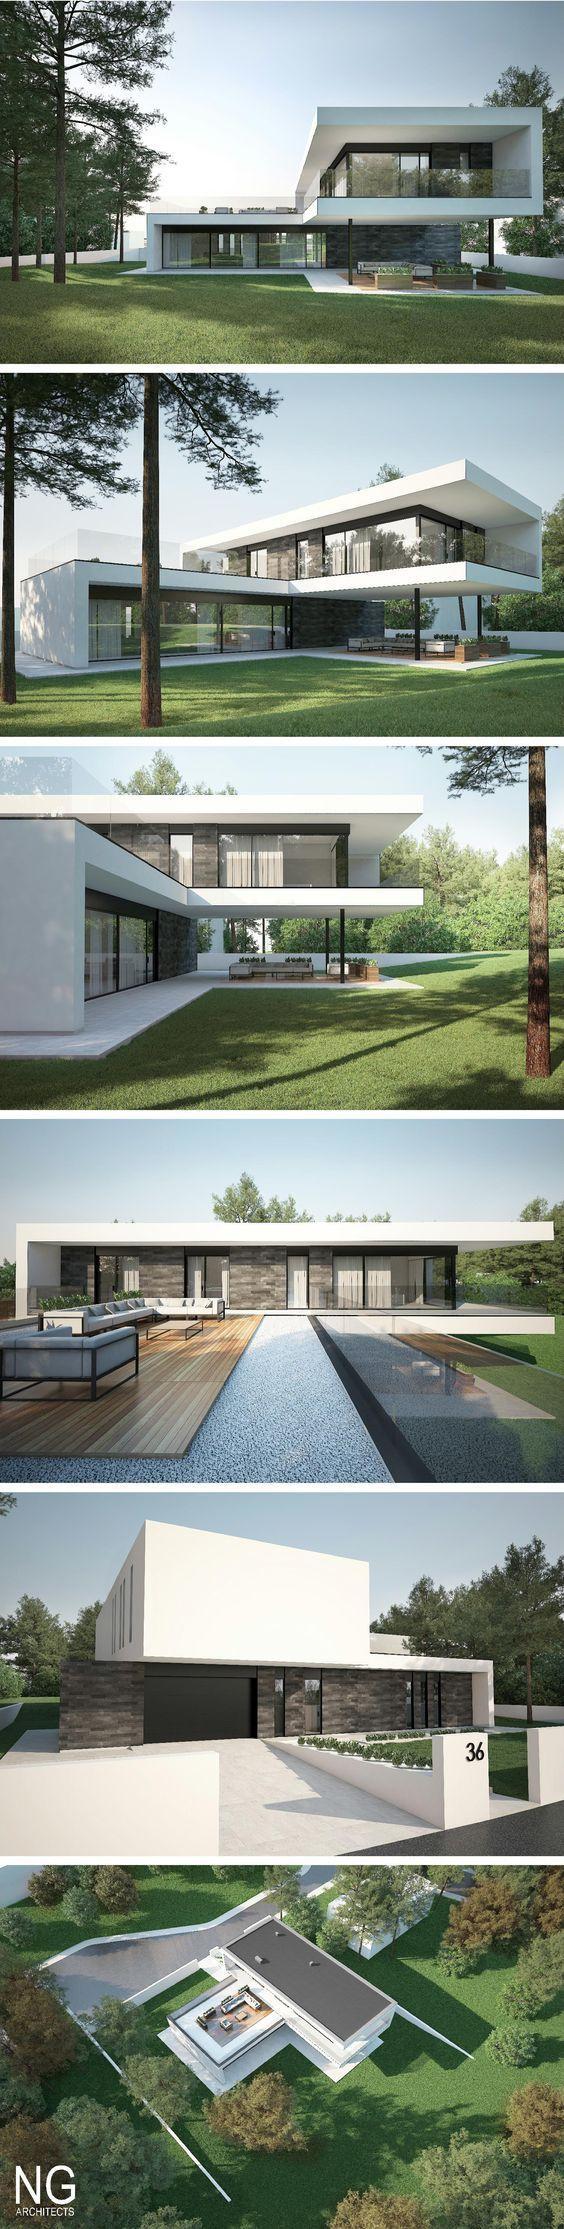 home landscape design studio for mac 14 1 ashampoo home designer